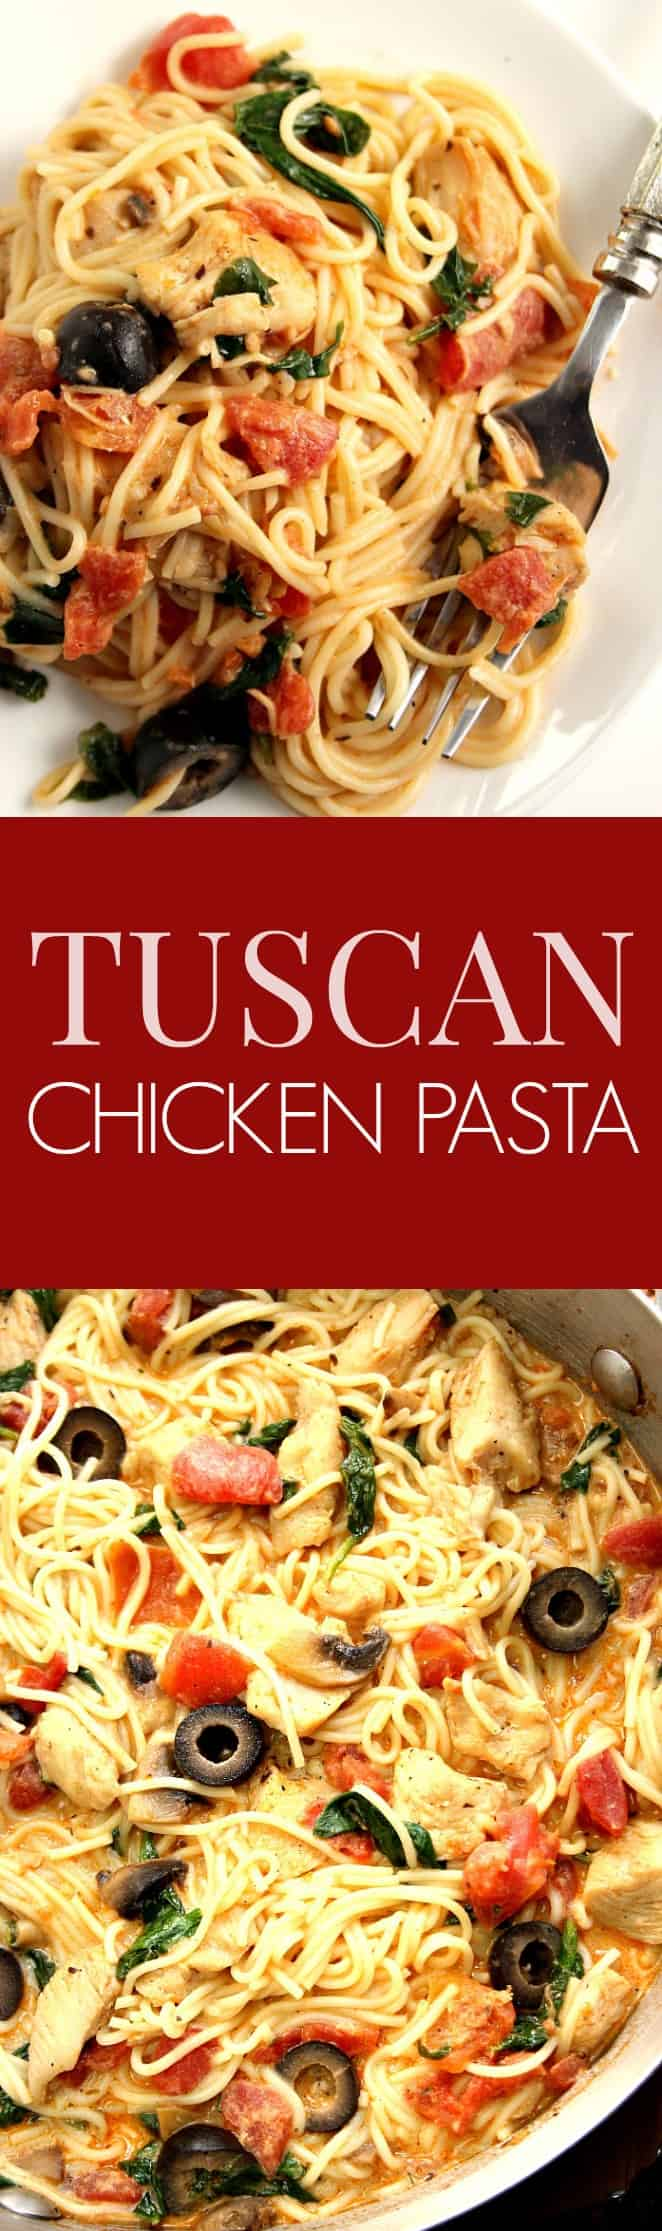 Easy saucy pasta recipes